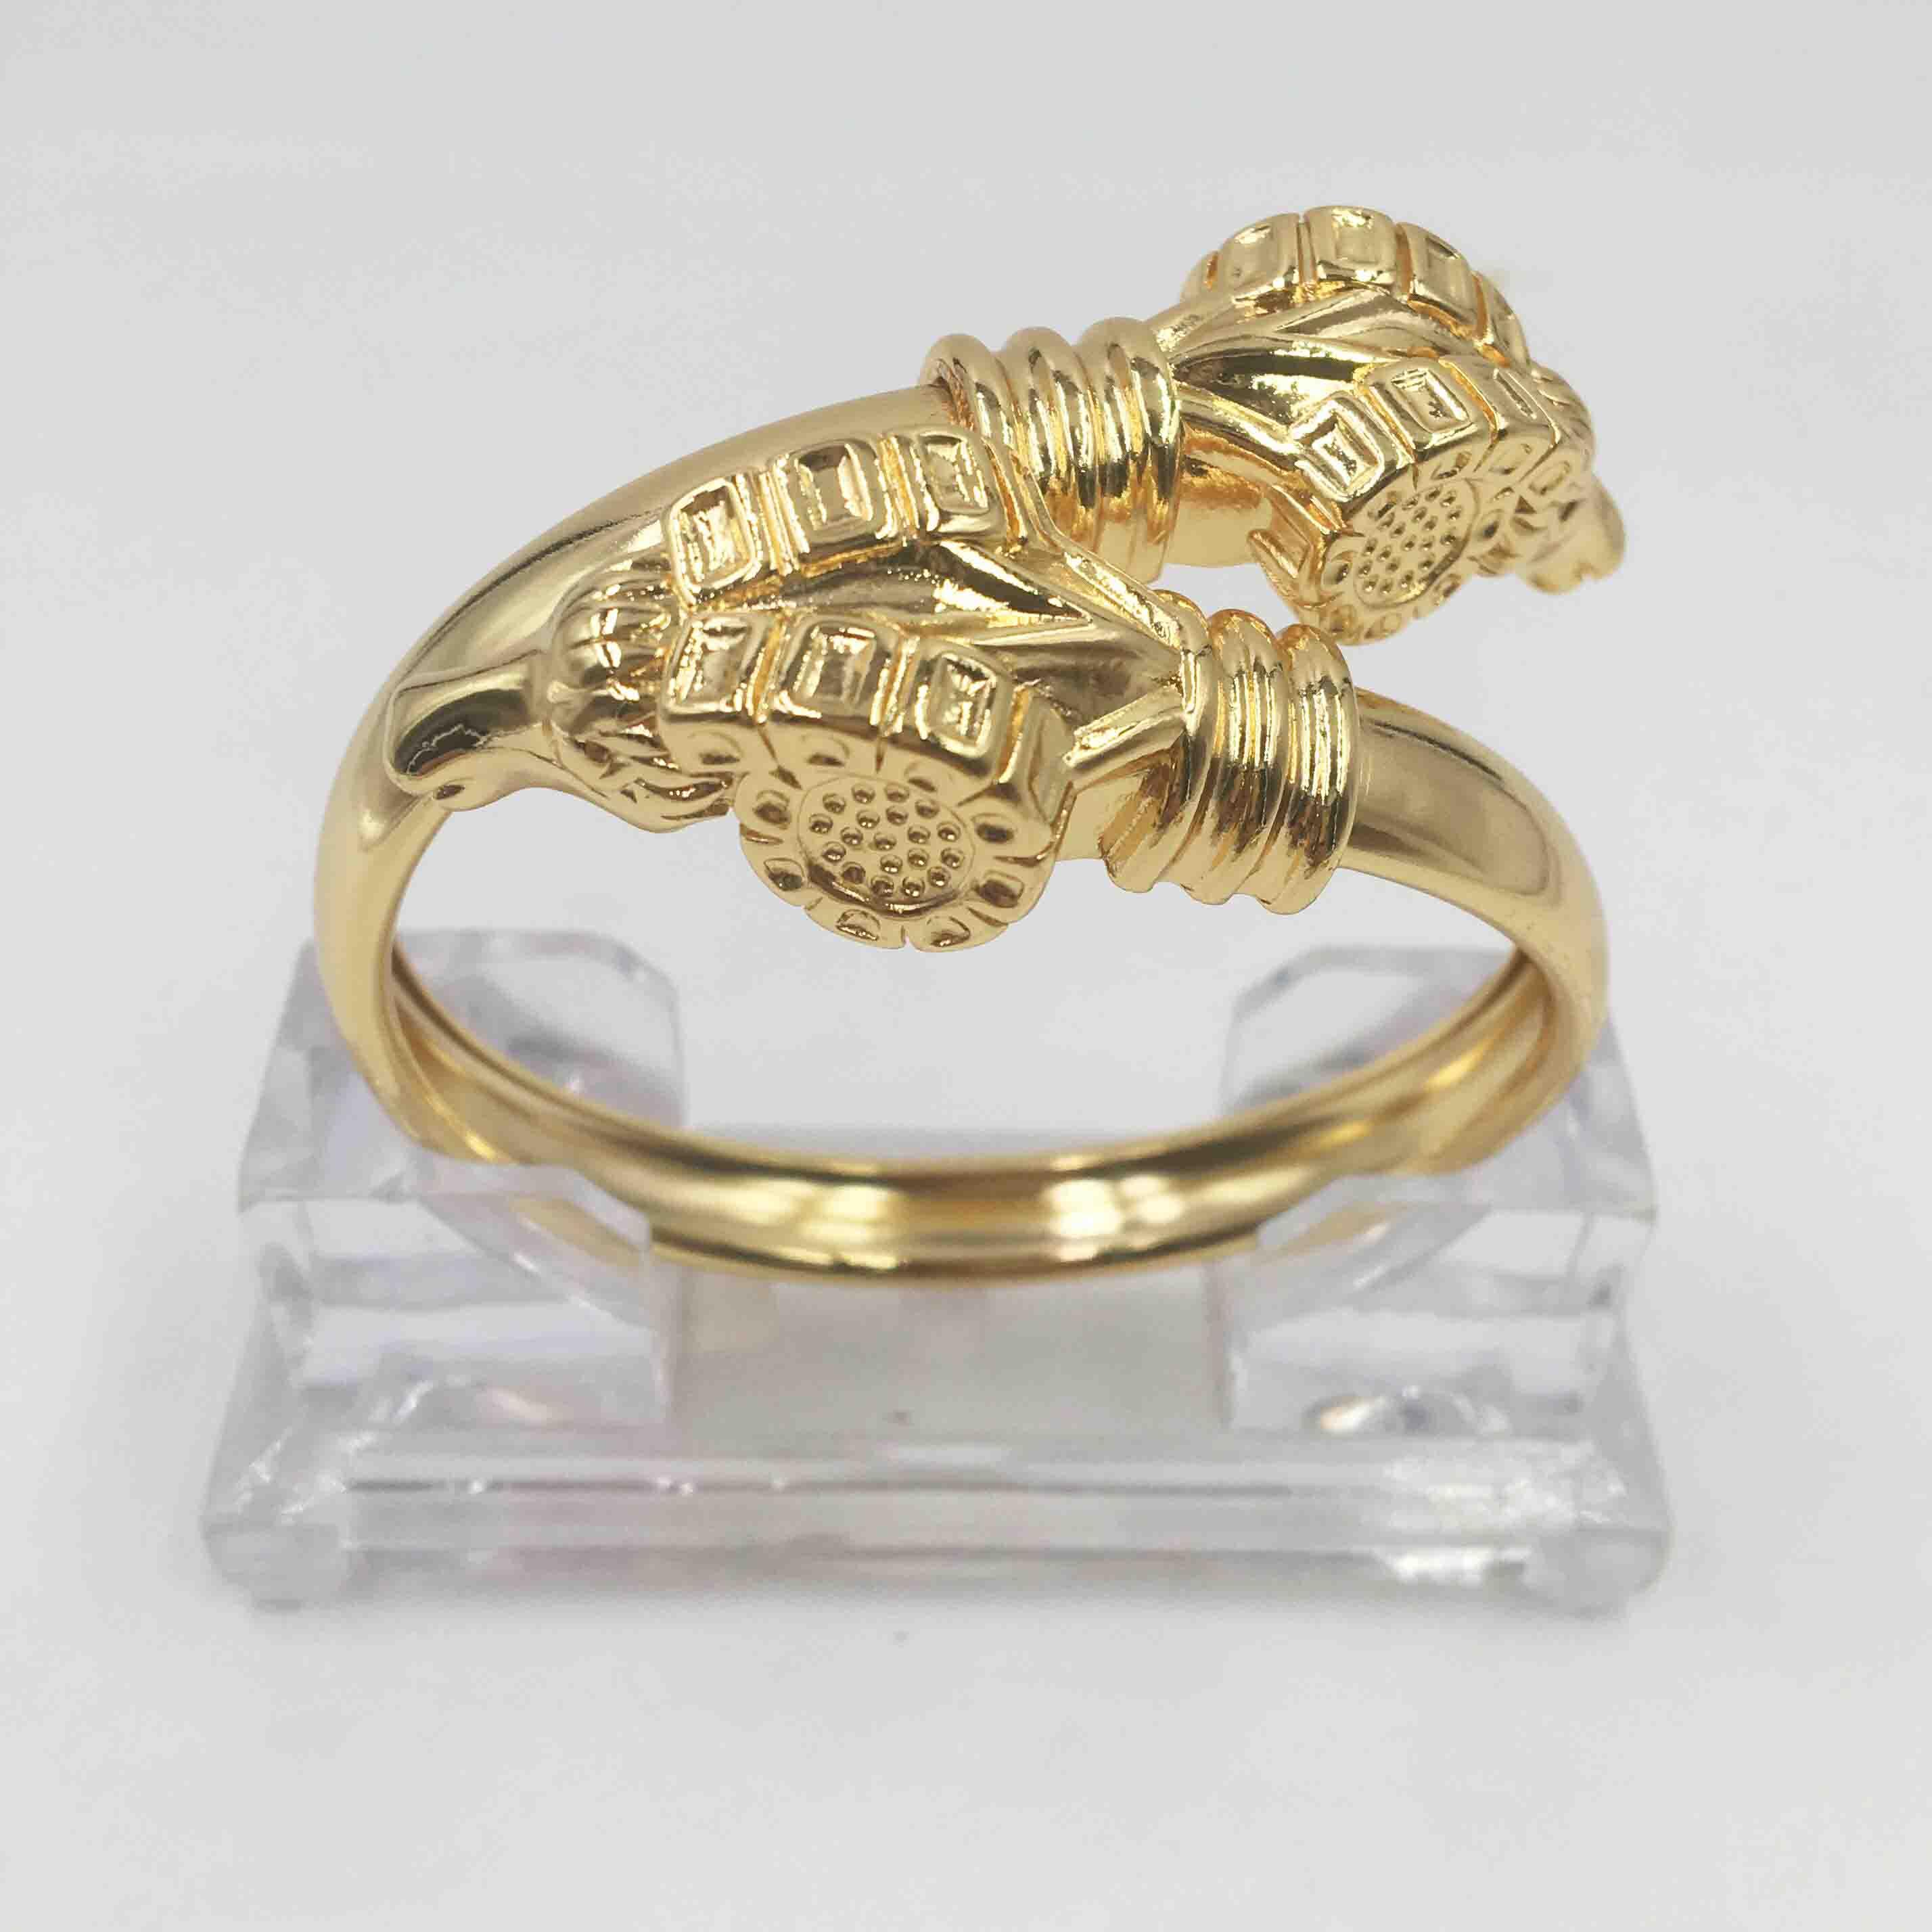 Alta qualidade italiano ouro colorido conjunto de jóias para mulheres africano frisado jóias moda pulseiras e anéis